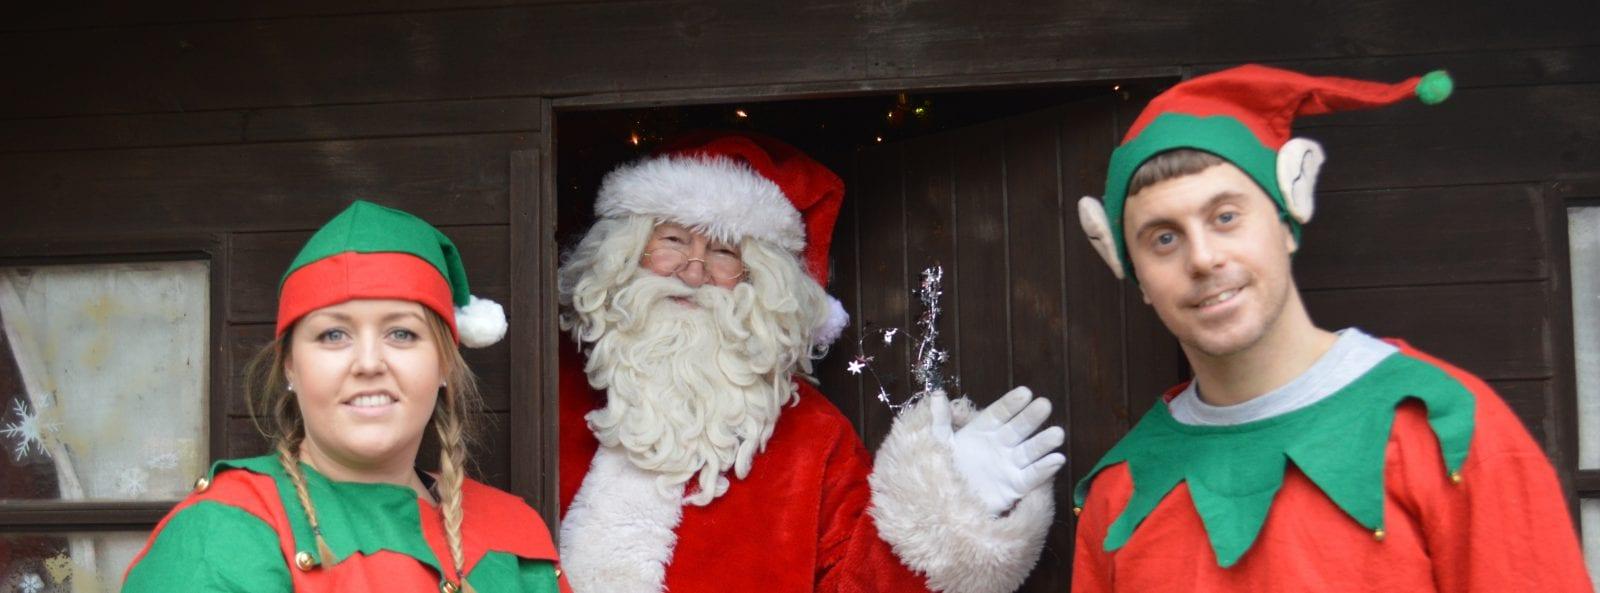 Elves and Santa